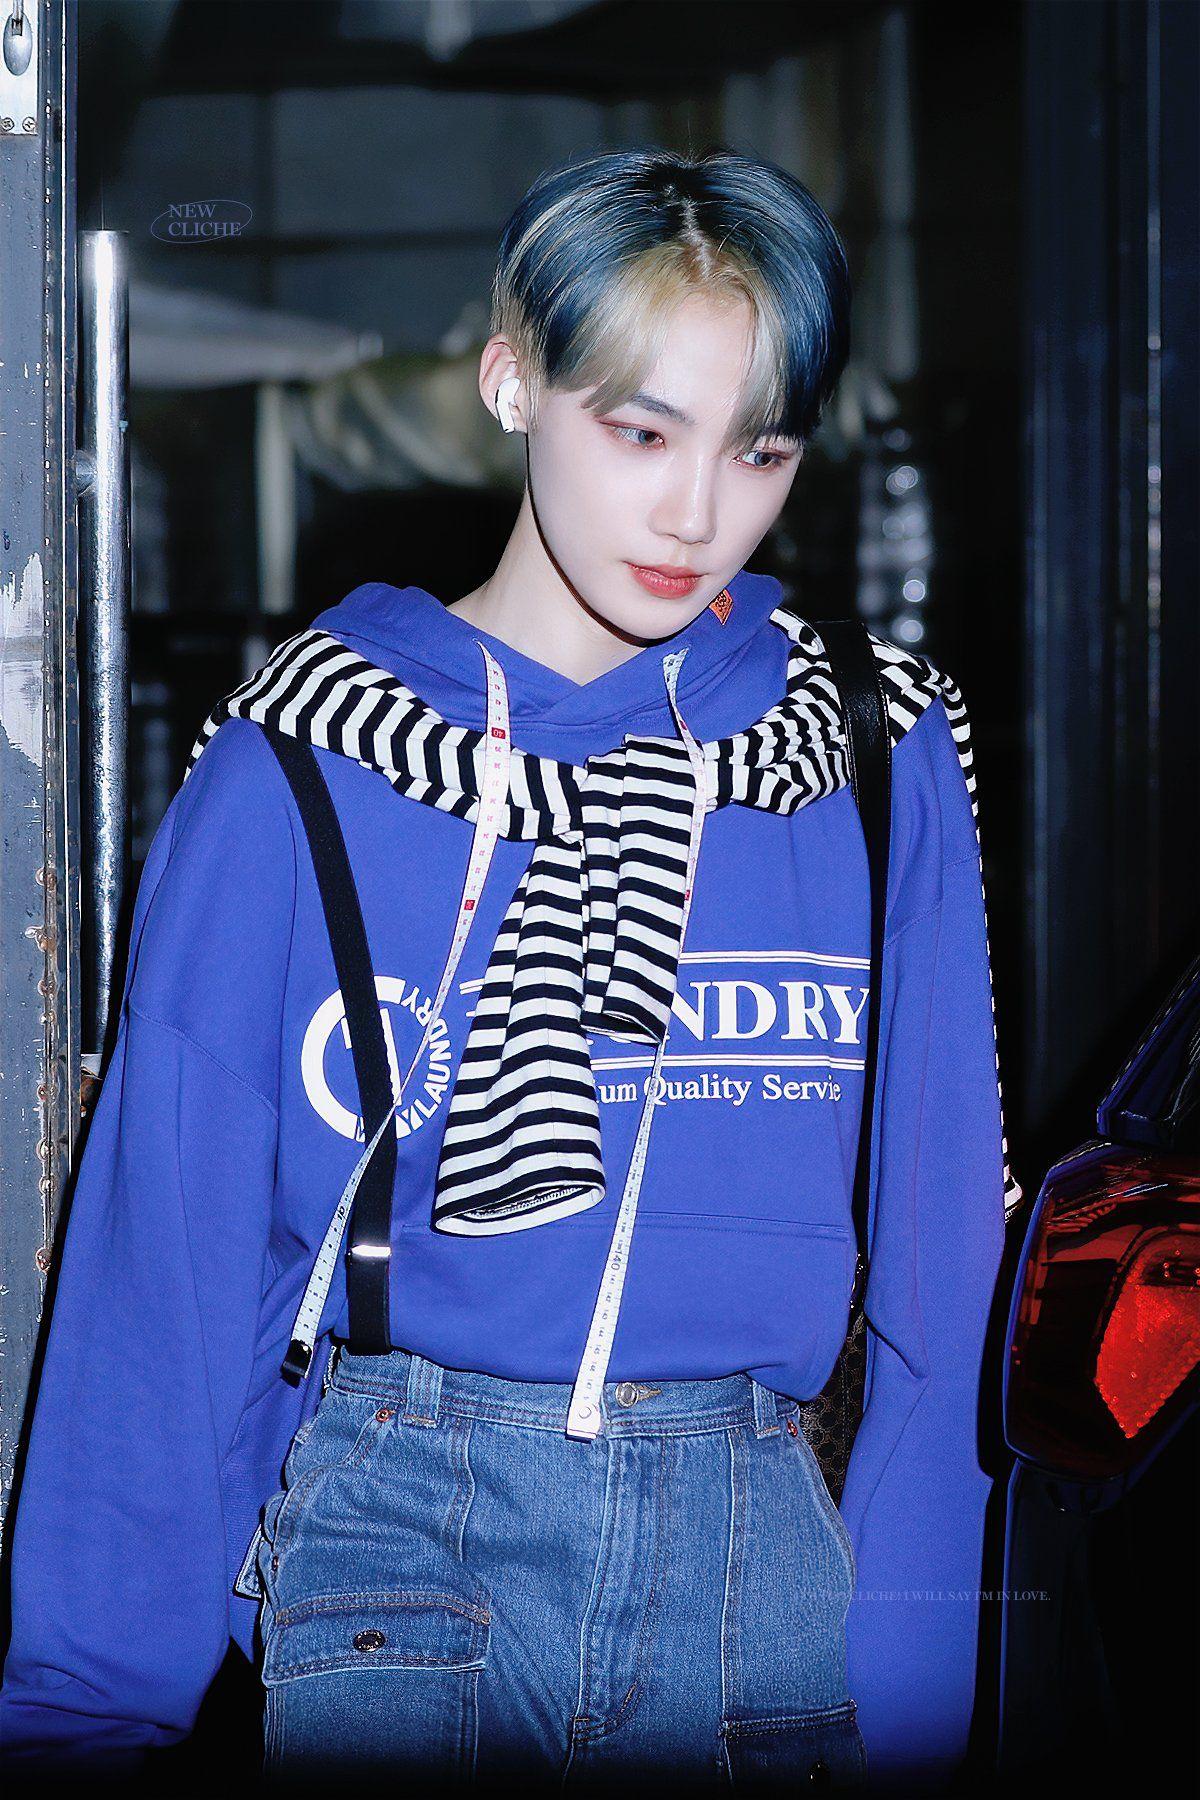 Pin By On The Boyz Fashion Inspo Outfits Fashion Outfits